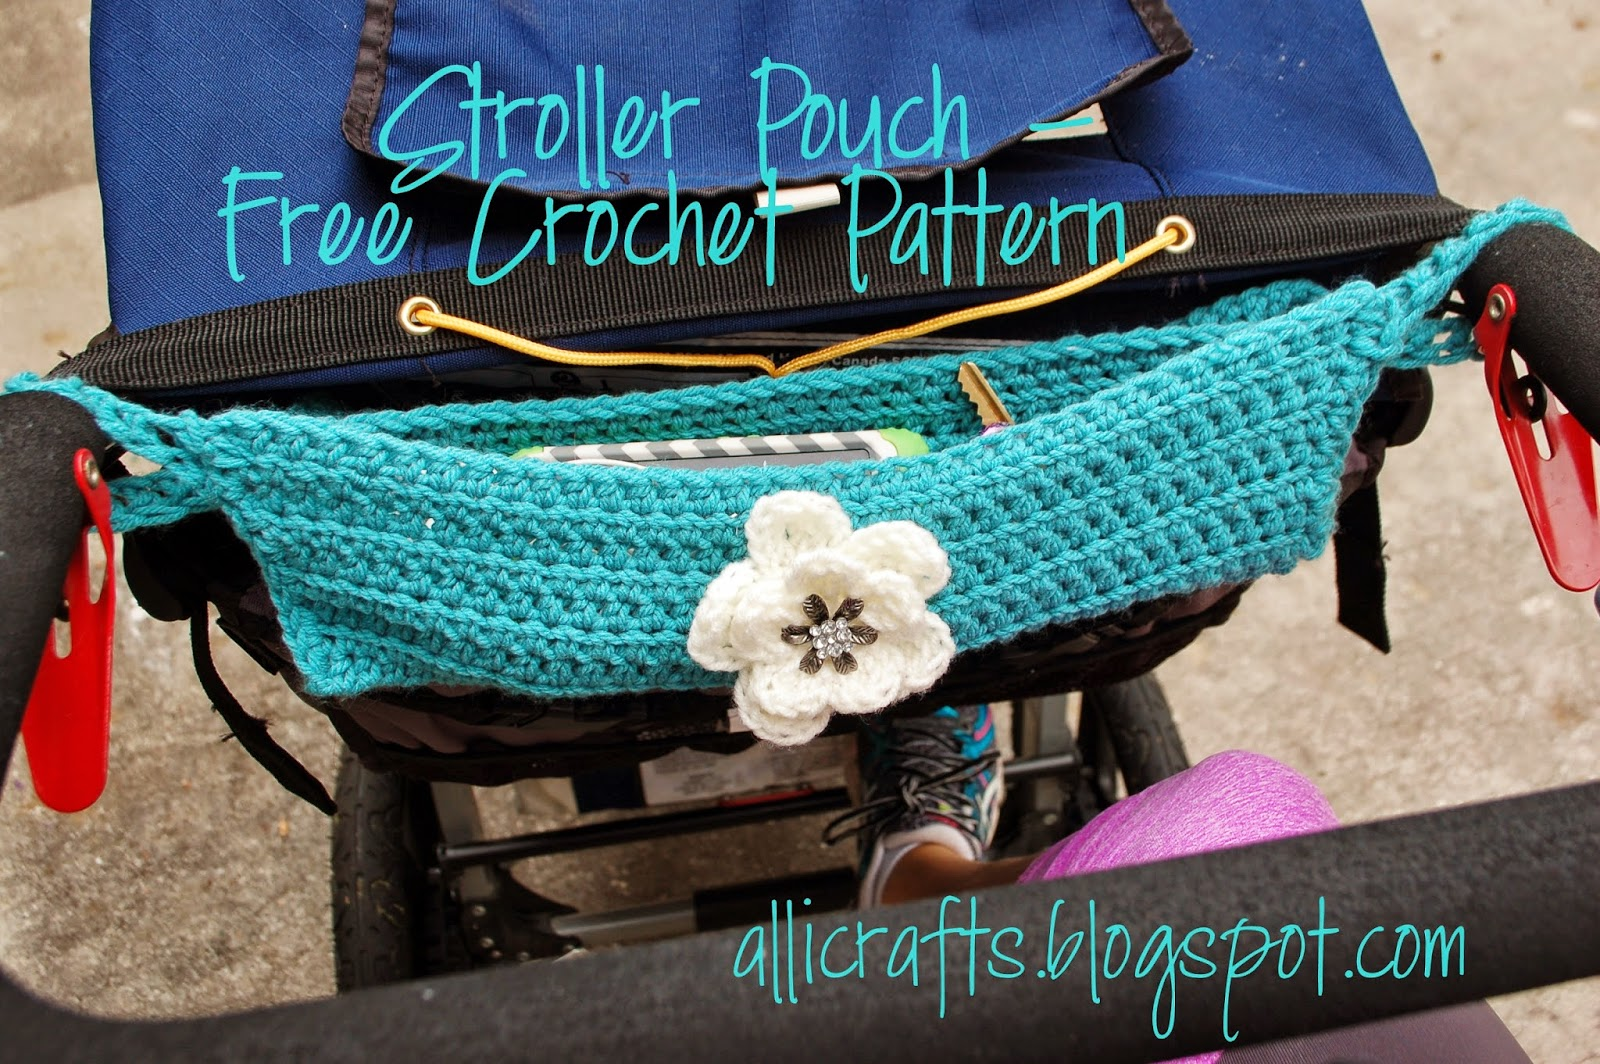 Alli Crafts: Free Crochet Pattern: Stroller Pouch